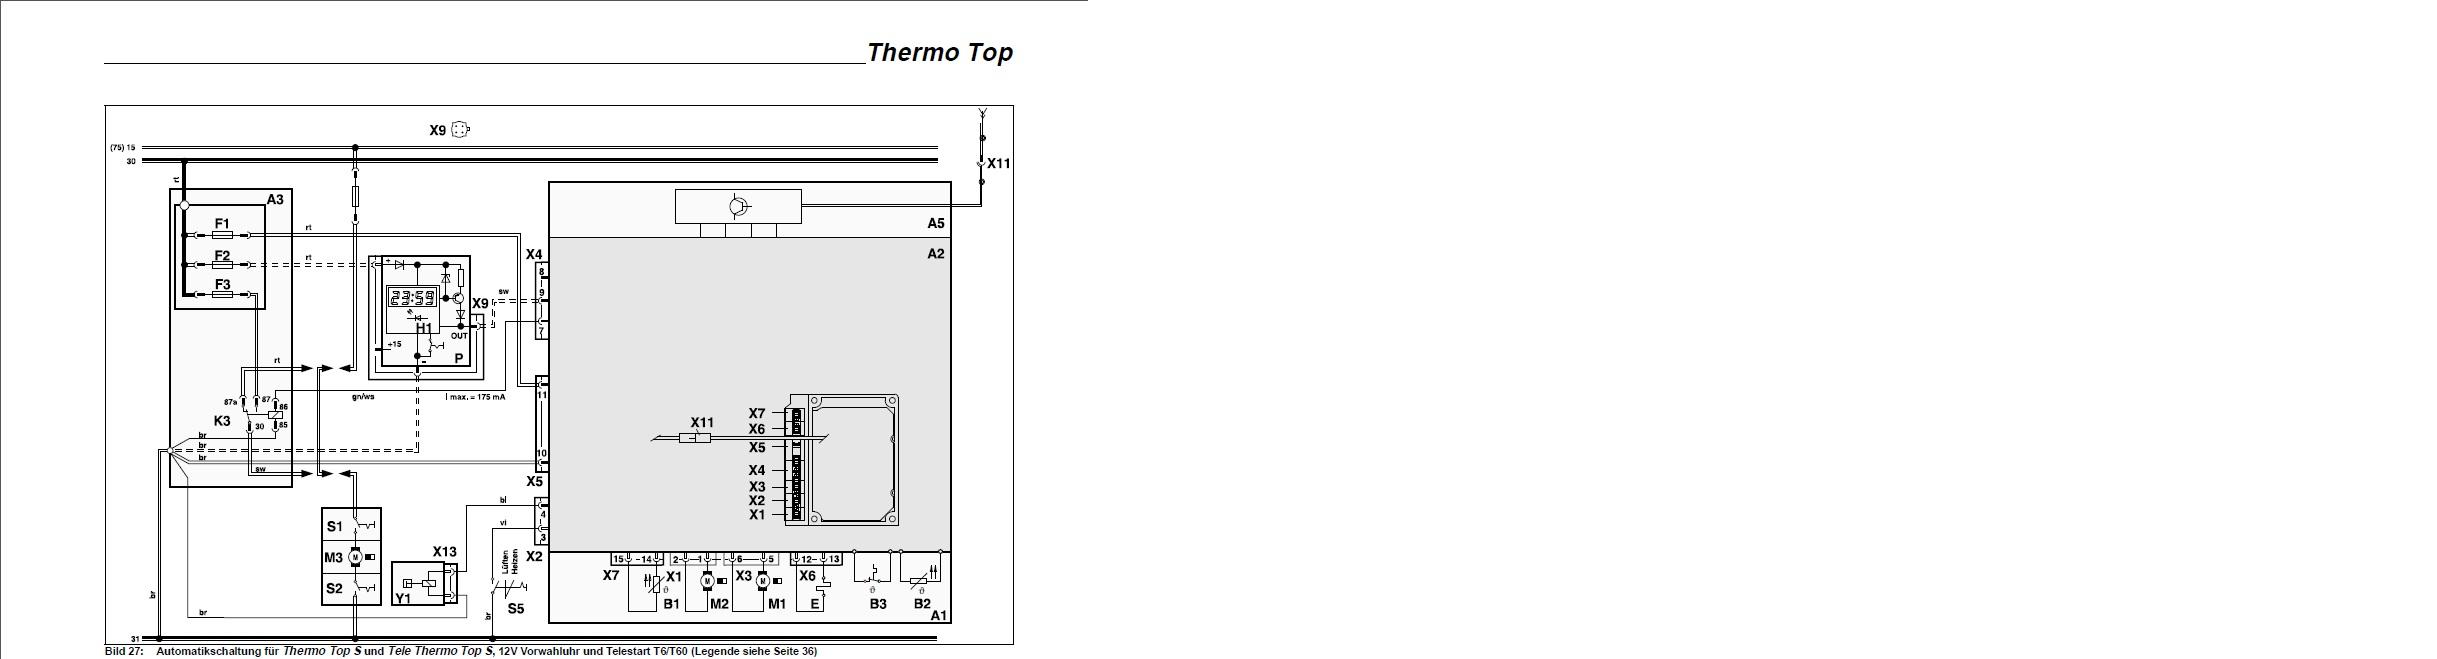 Webasto Thermo Top BW 50 zasilanie elektrozaworka/diagnoza